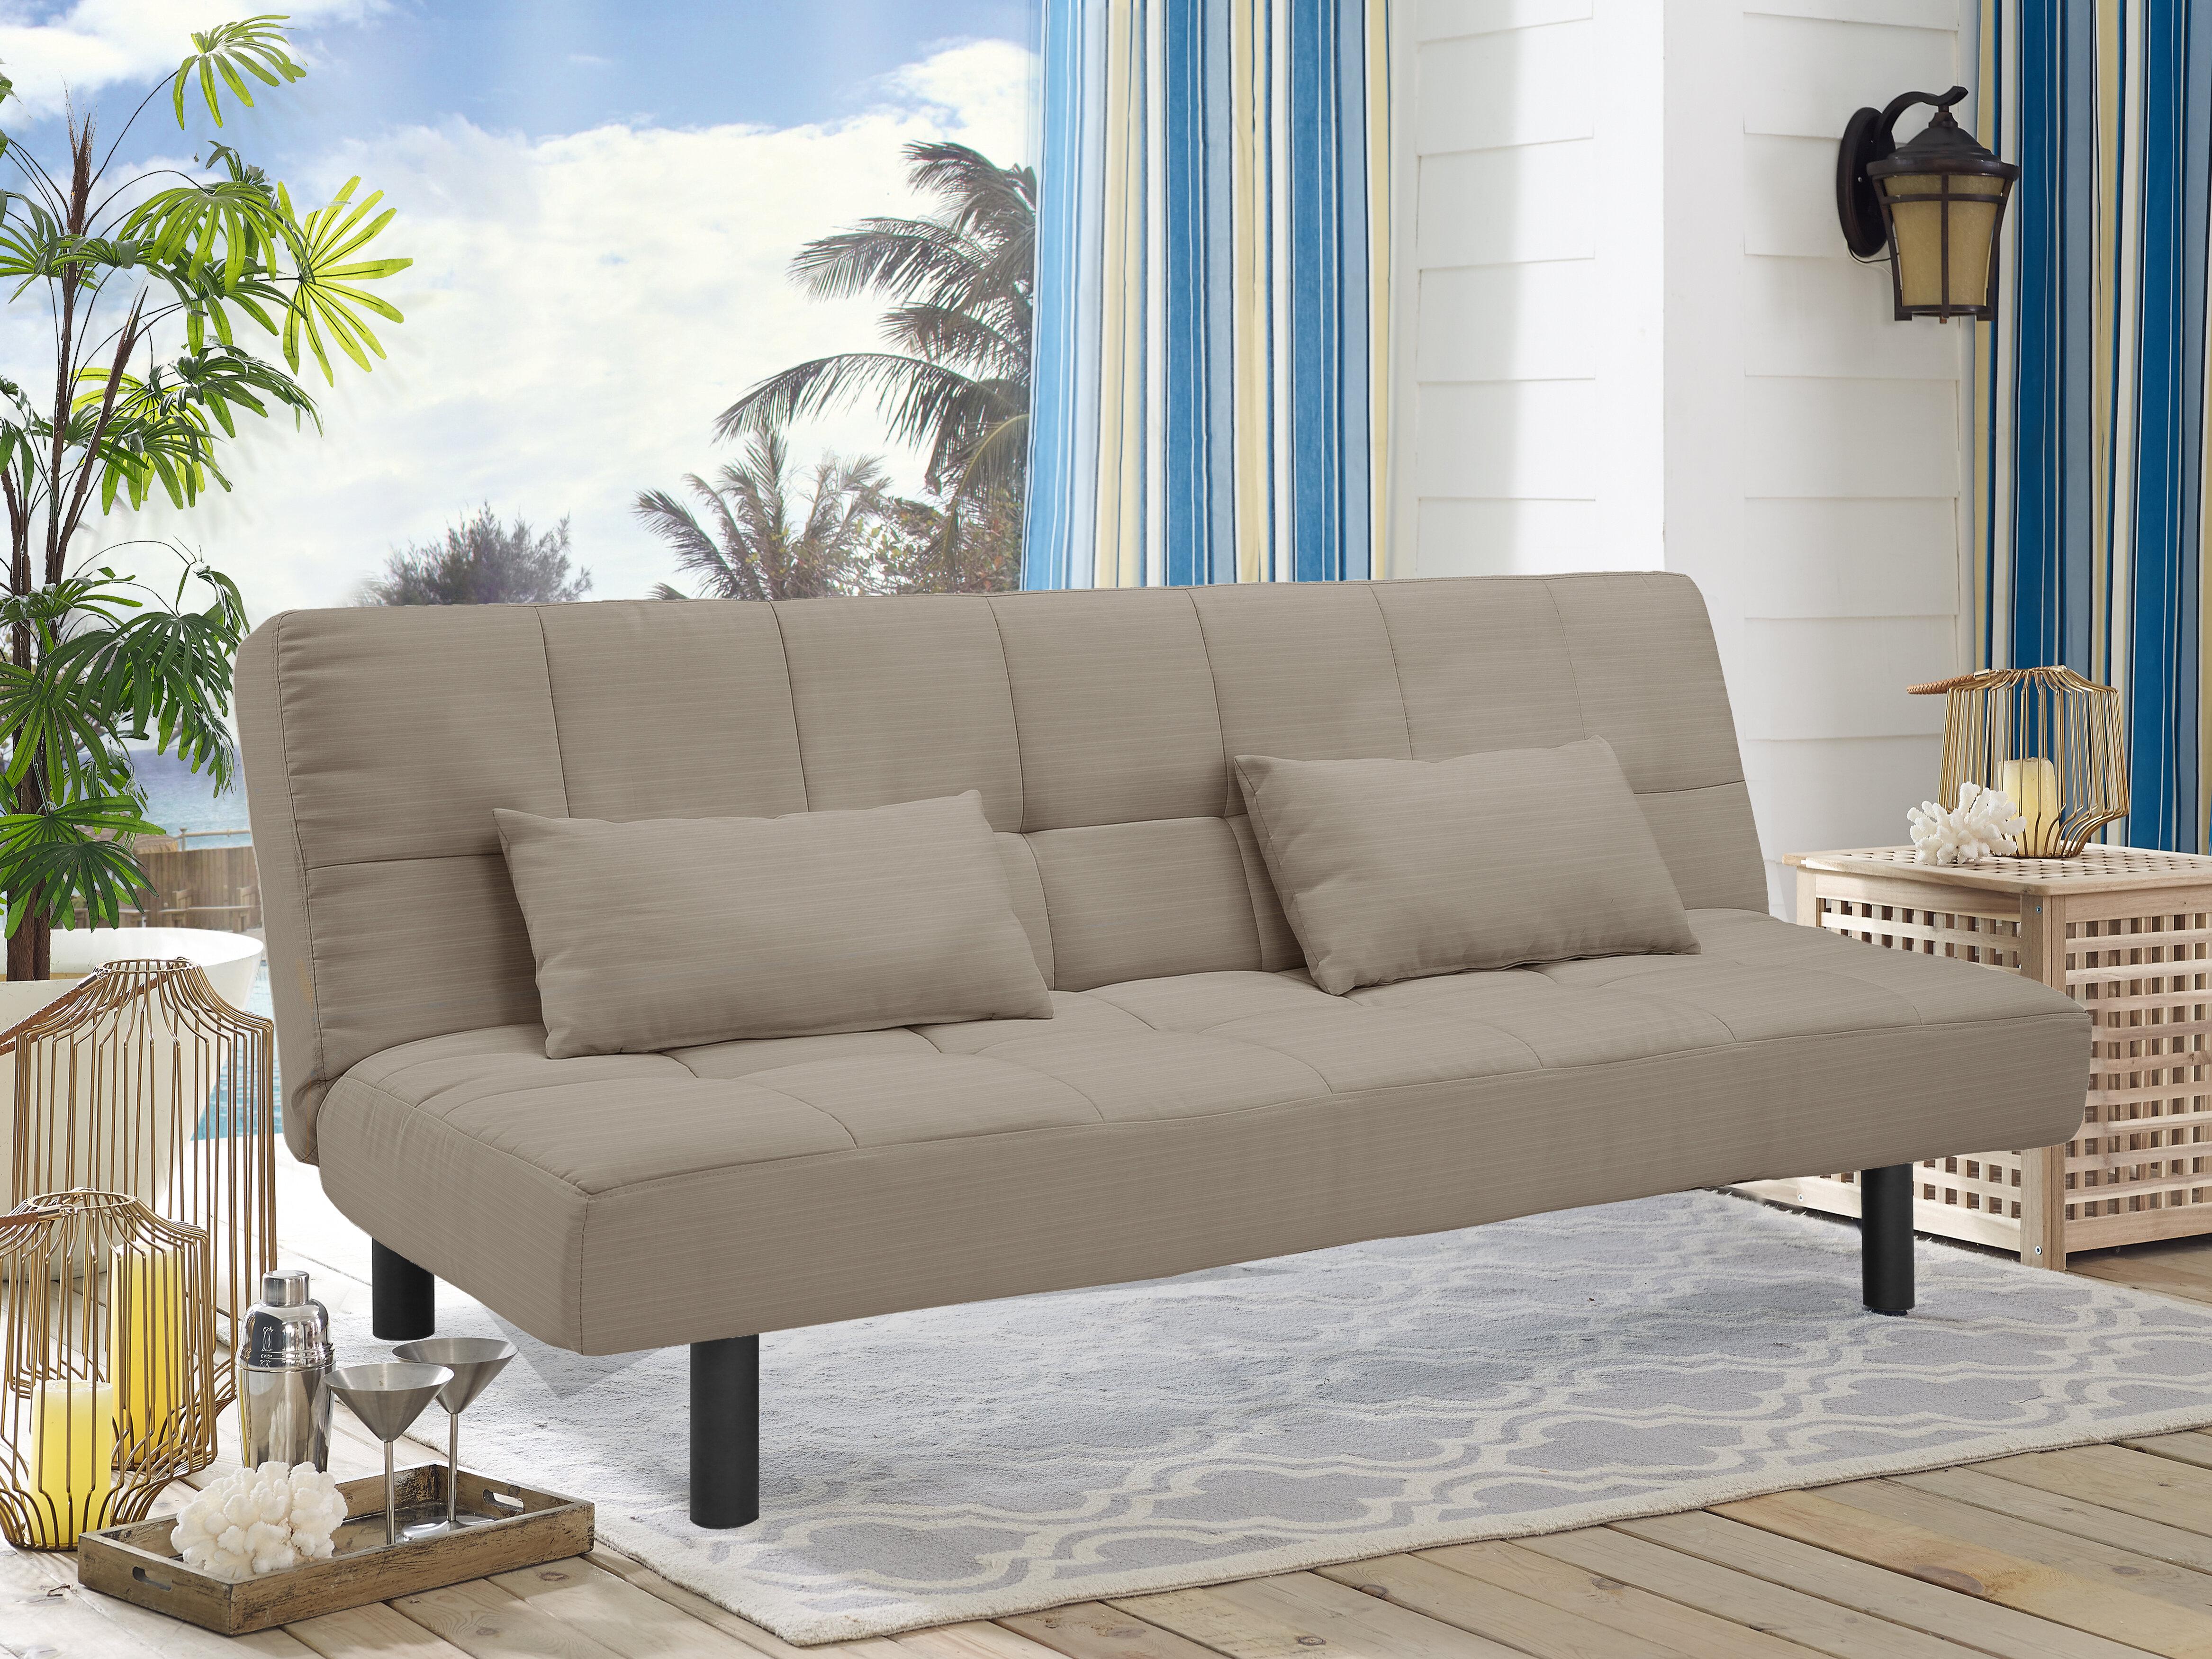 Serta Futons Santa Barbara Convertible Sofa | Wayfair